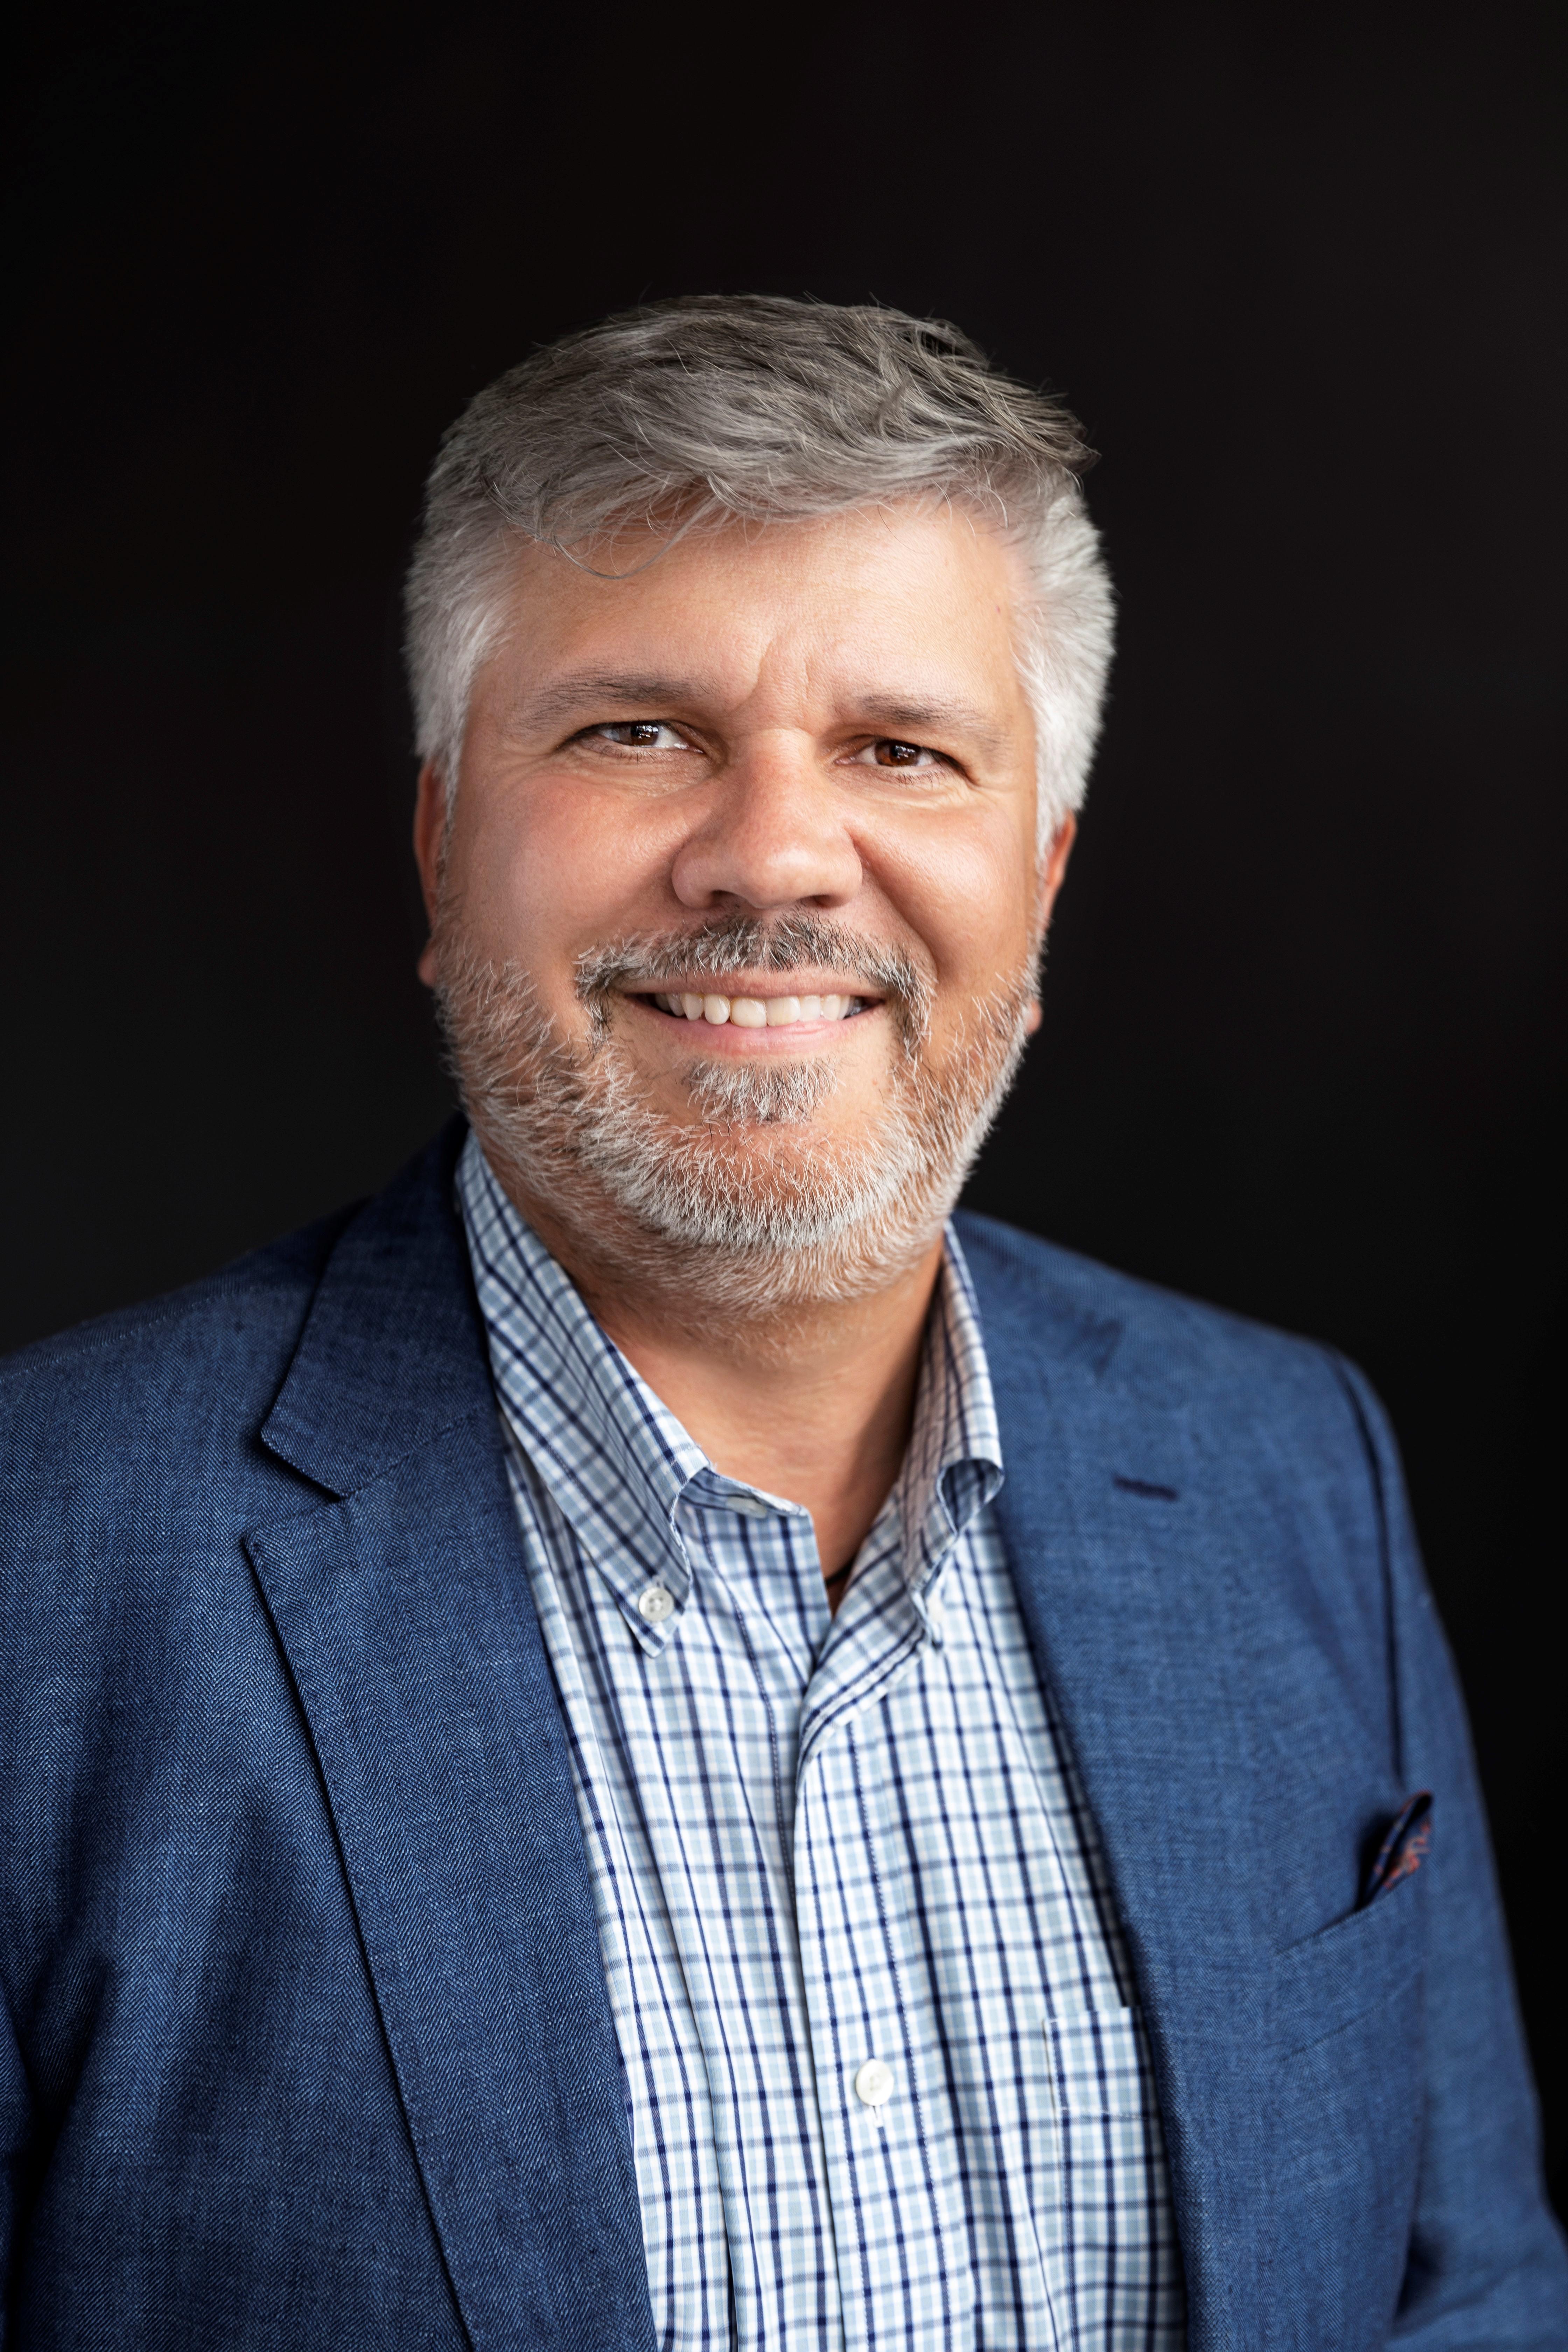 Michael Duggal wins 2021 Franklin Award